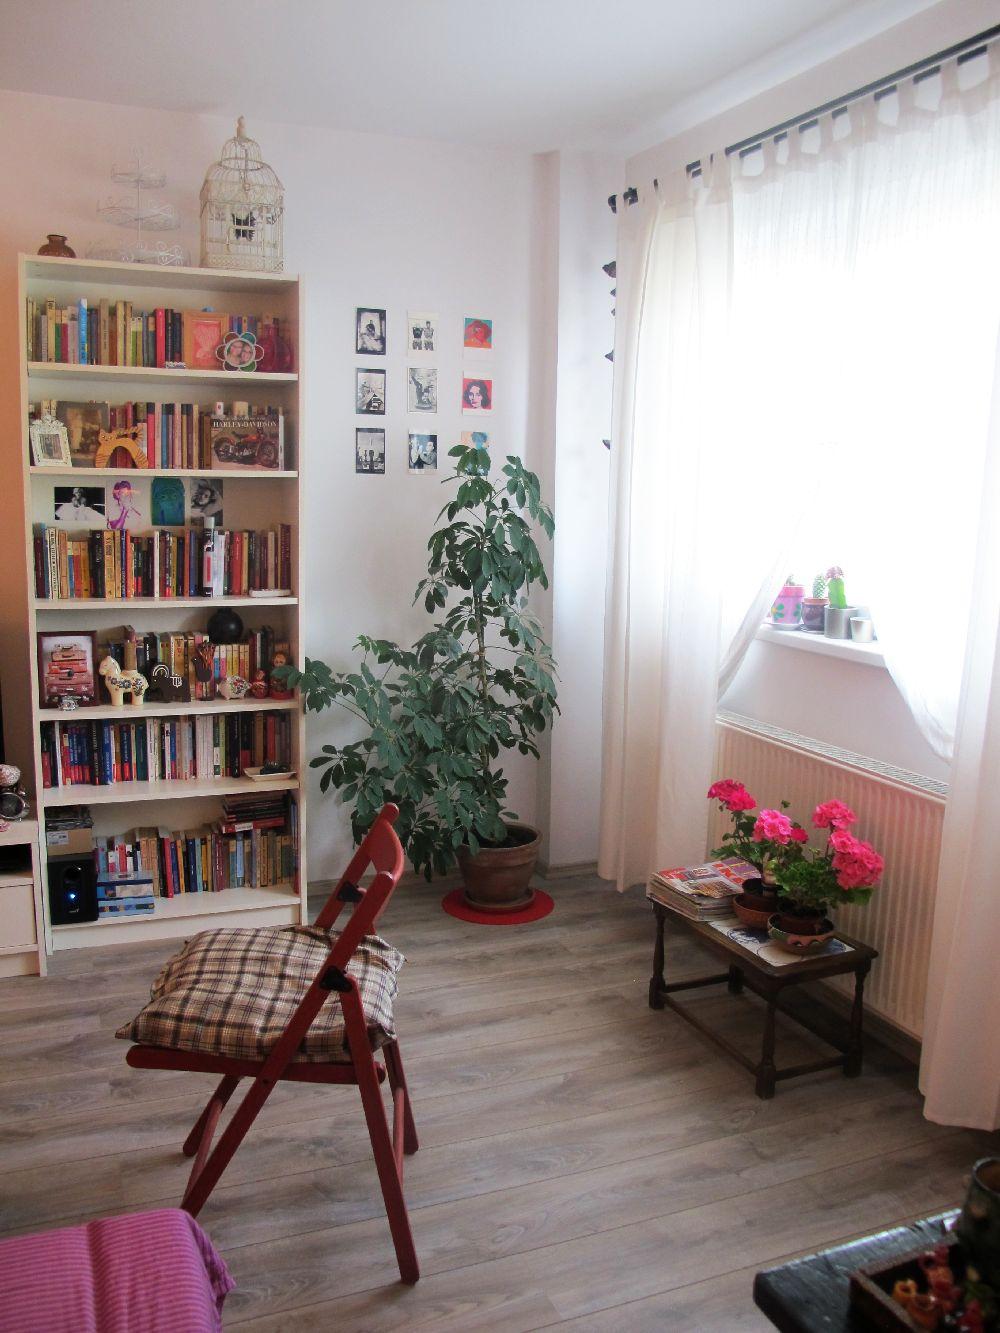 adelaparvu.com despre apartament 3 camere colorat in Sibiu, Foto Adela Parvu (72)